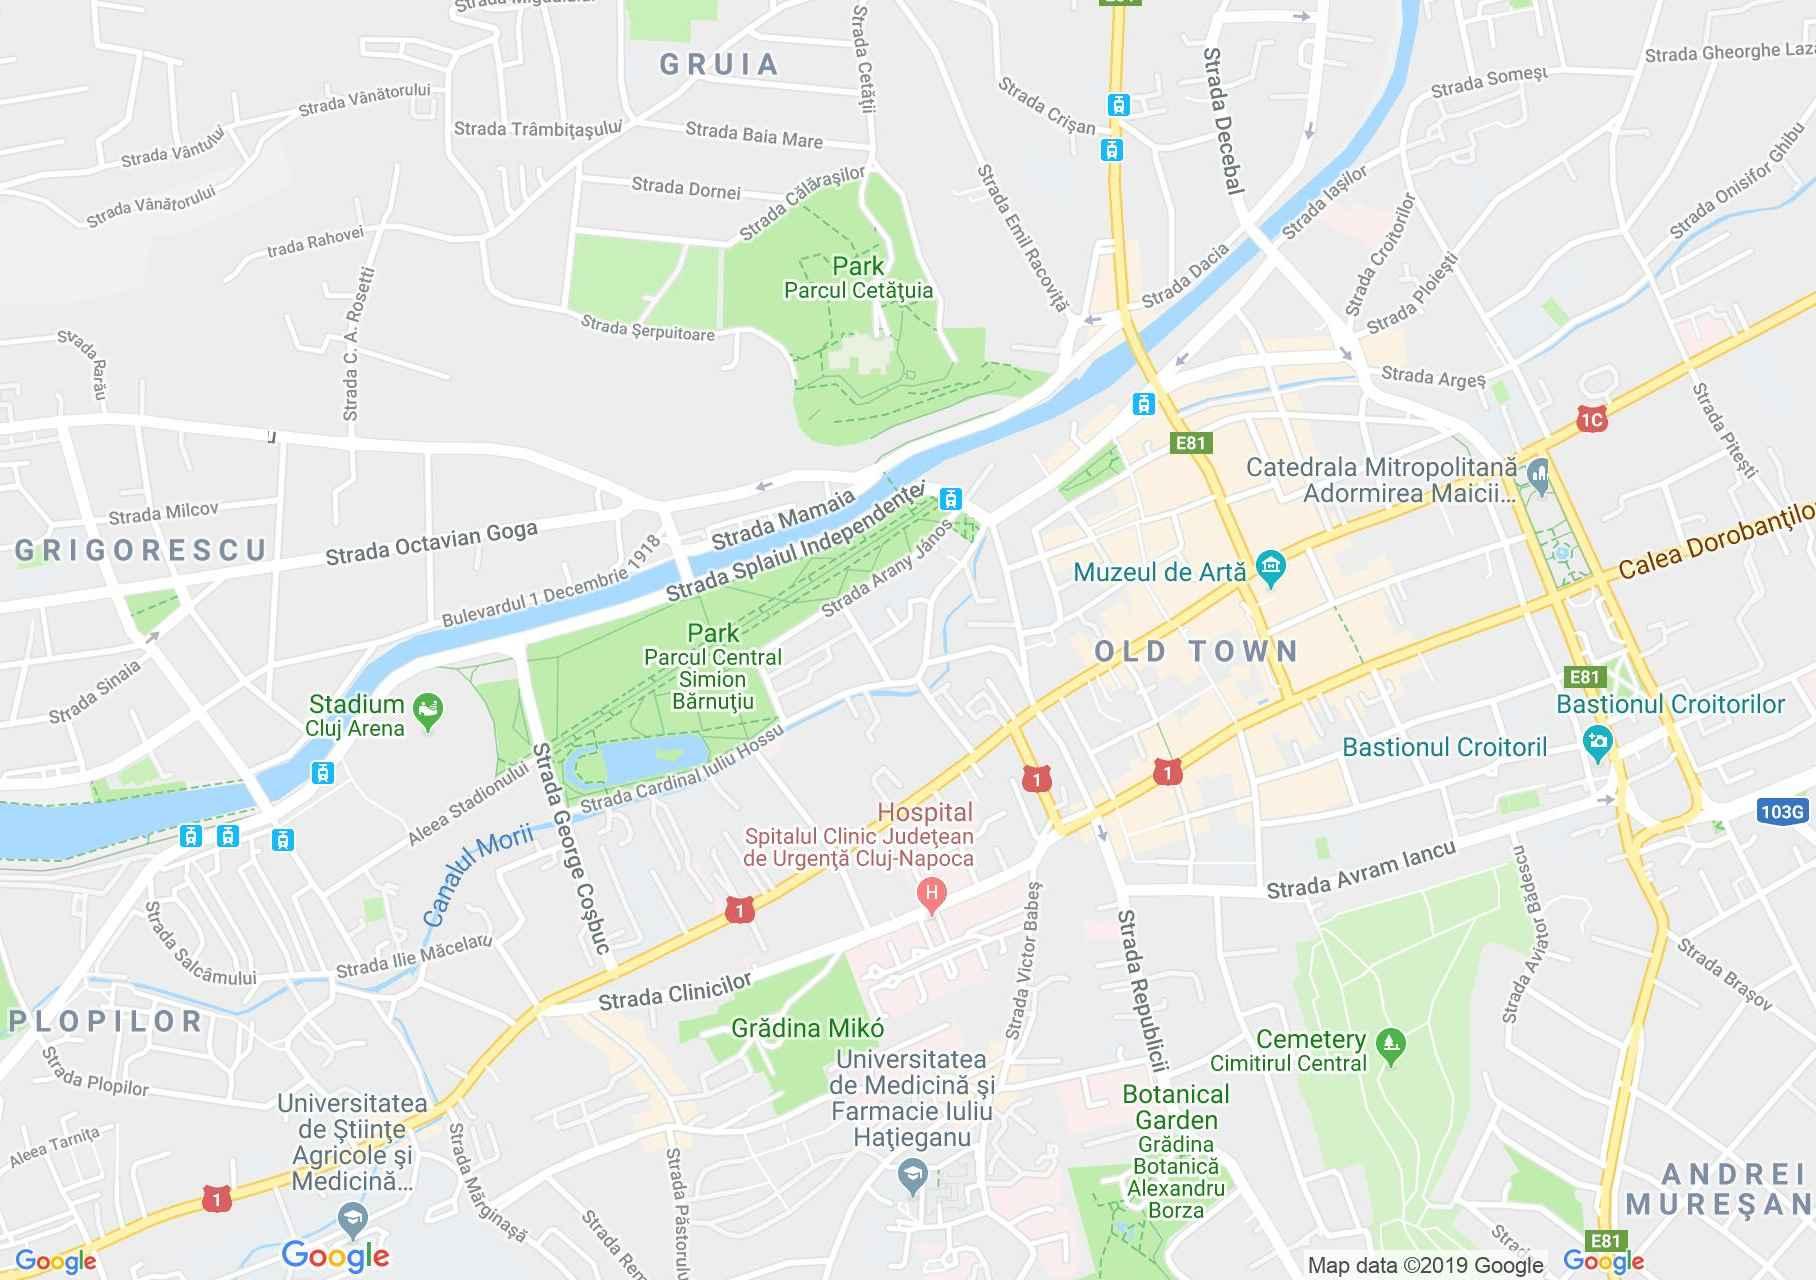 Map of Cluj-Napoca: Clinics